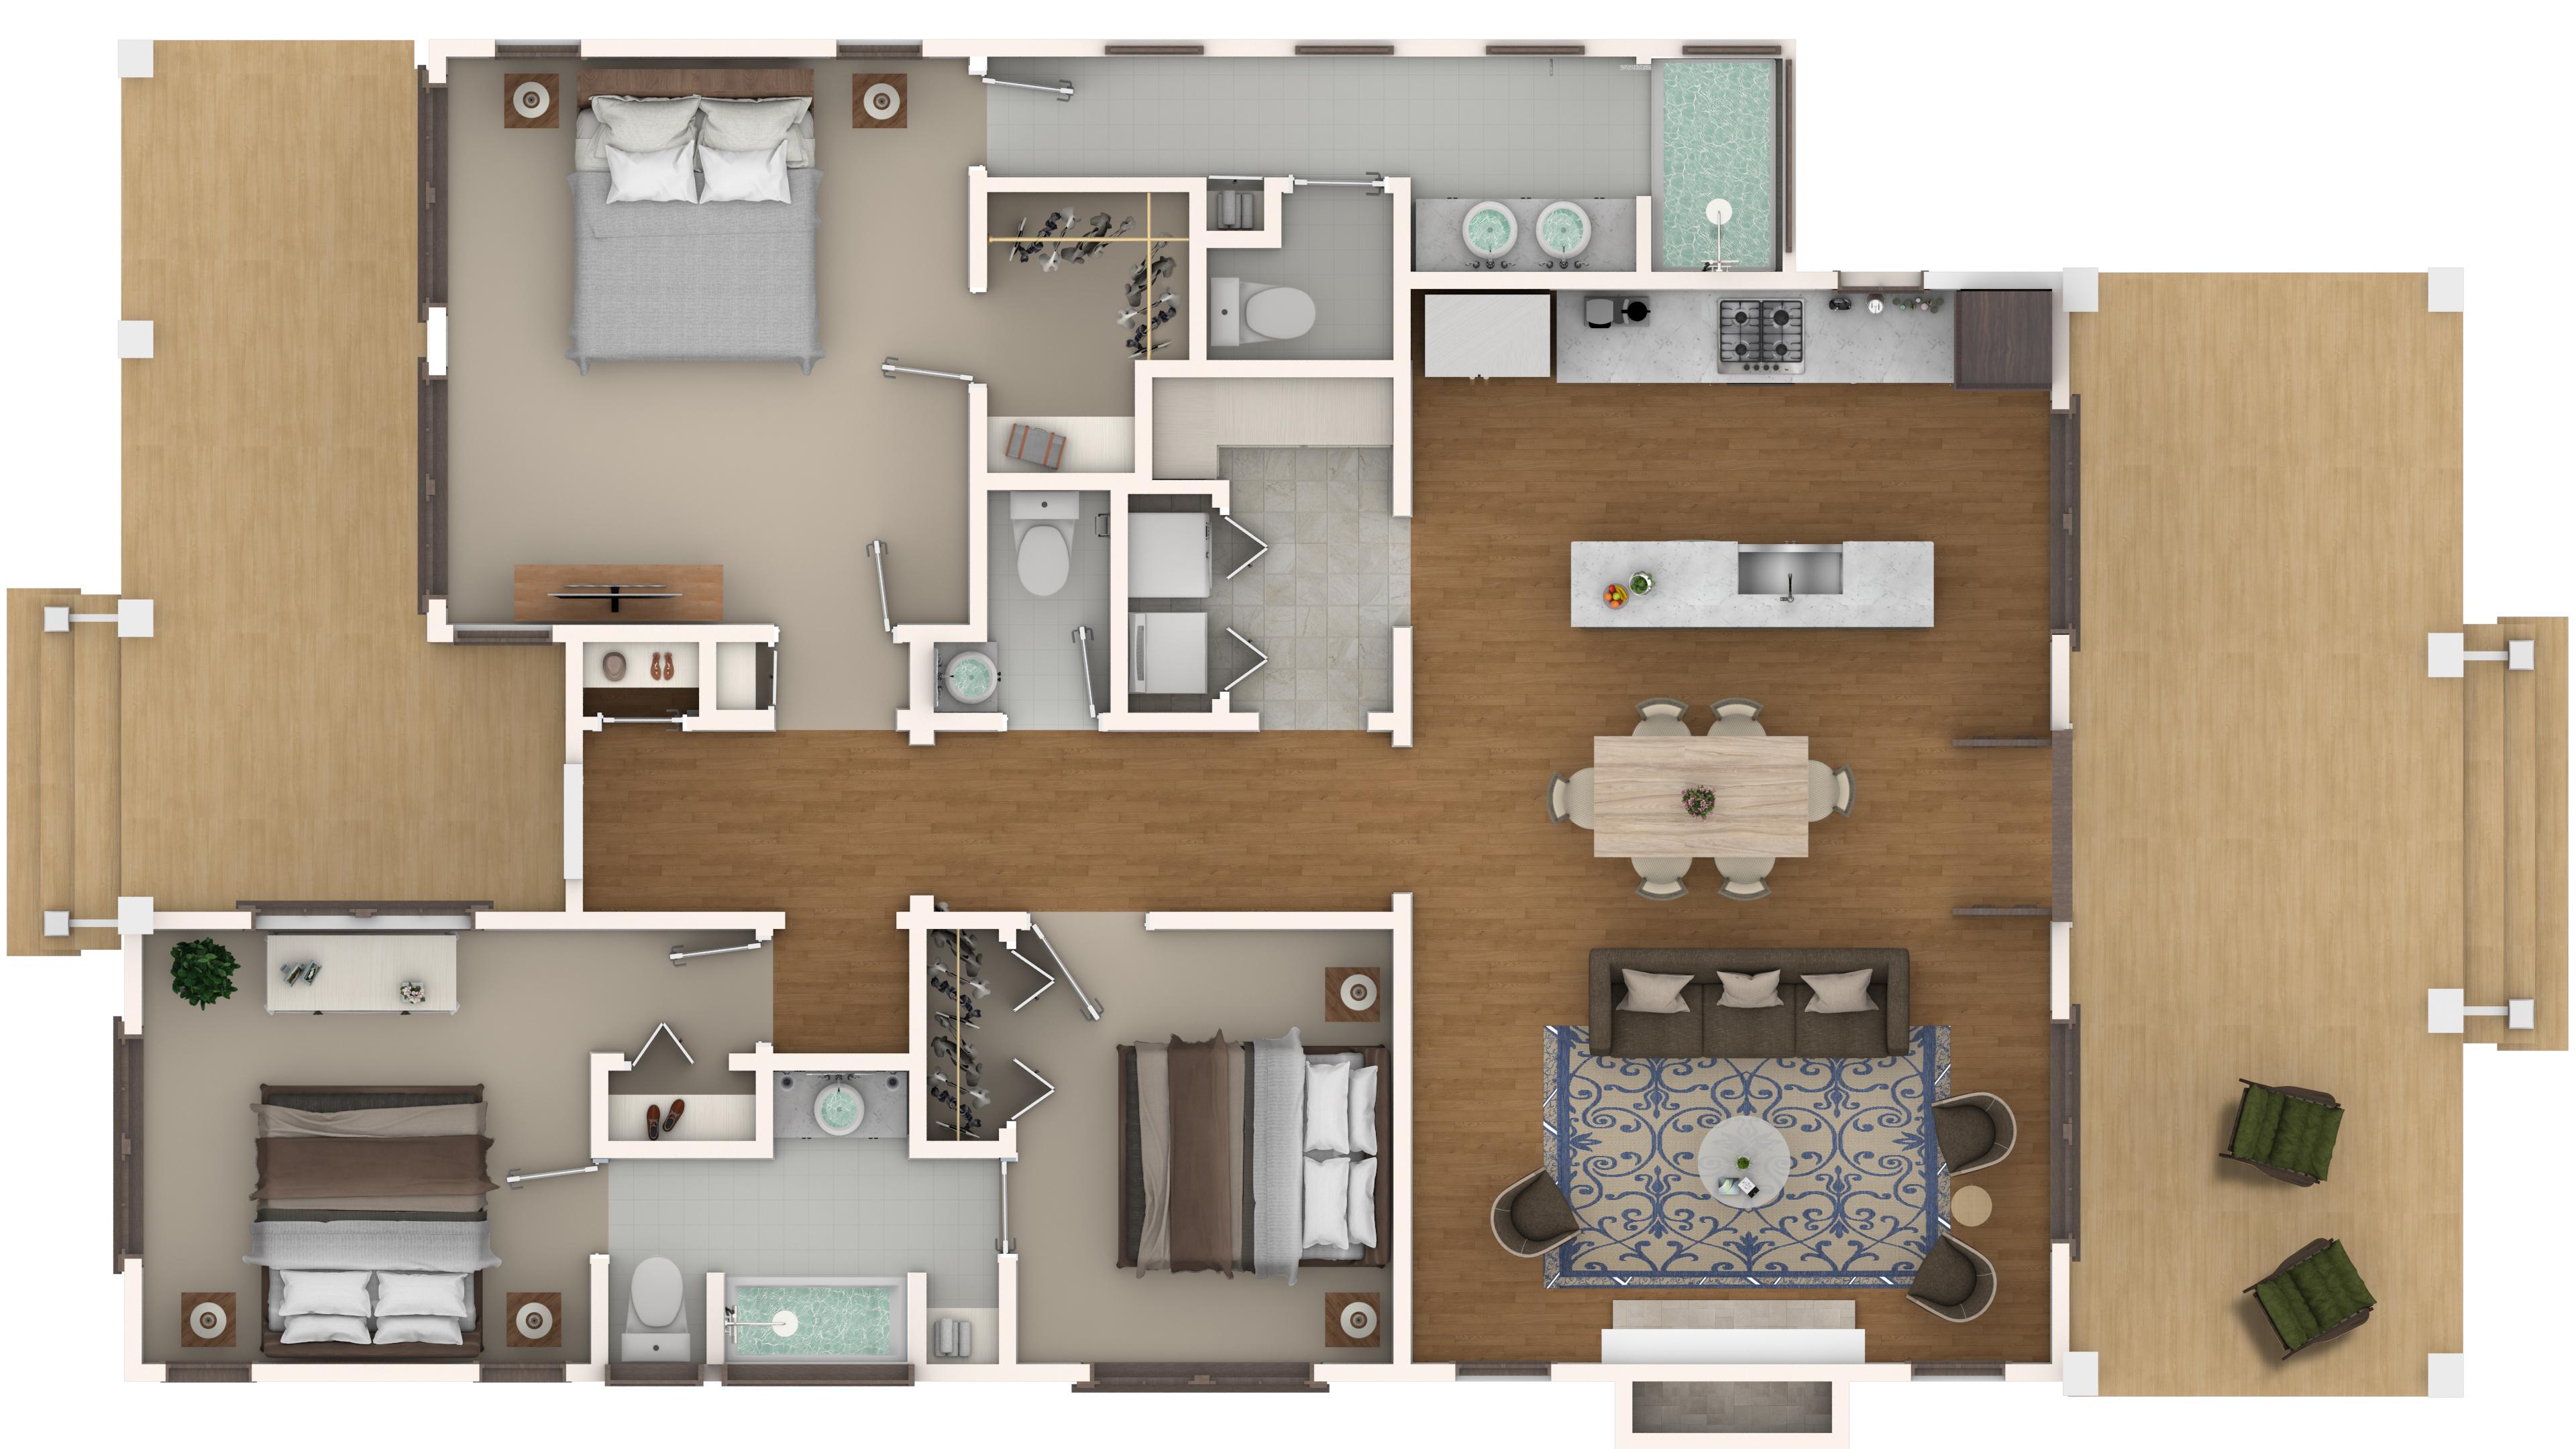 2d rendered floor plan artistic visions for Rendered floor plan